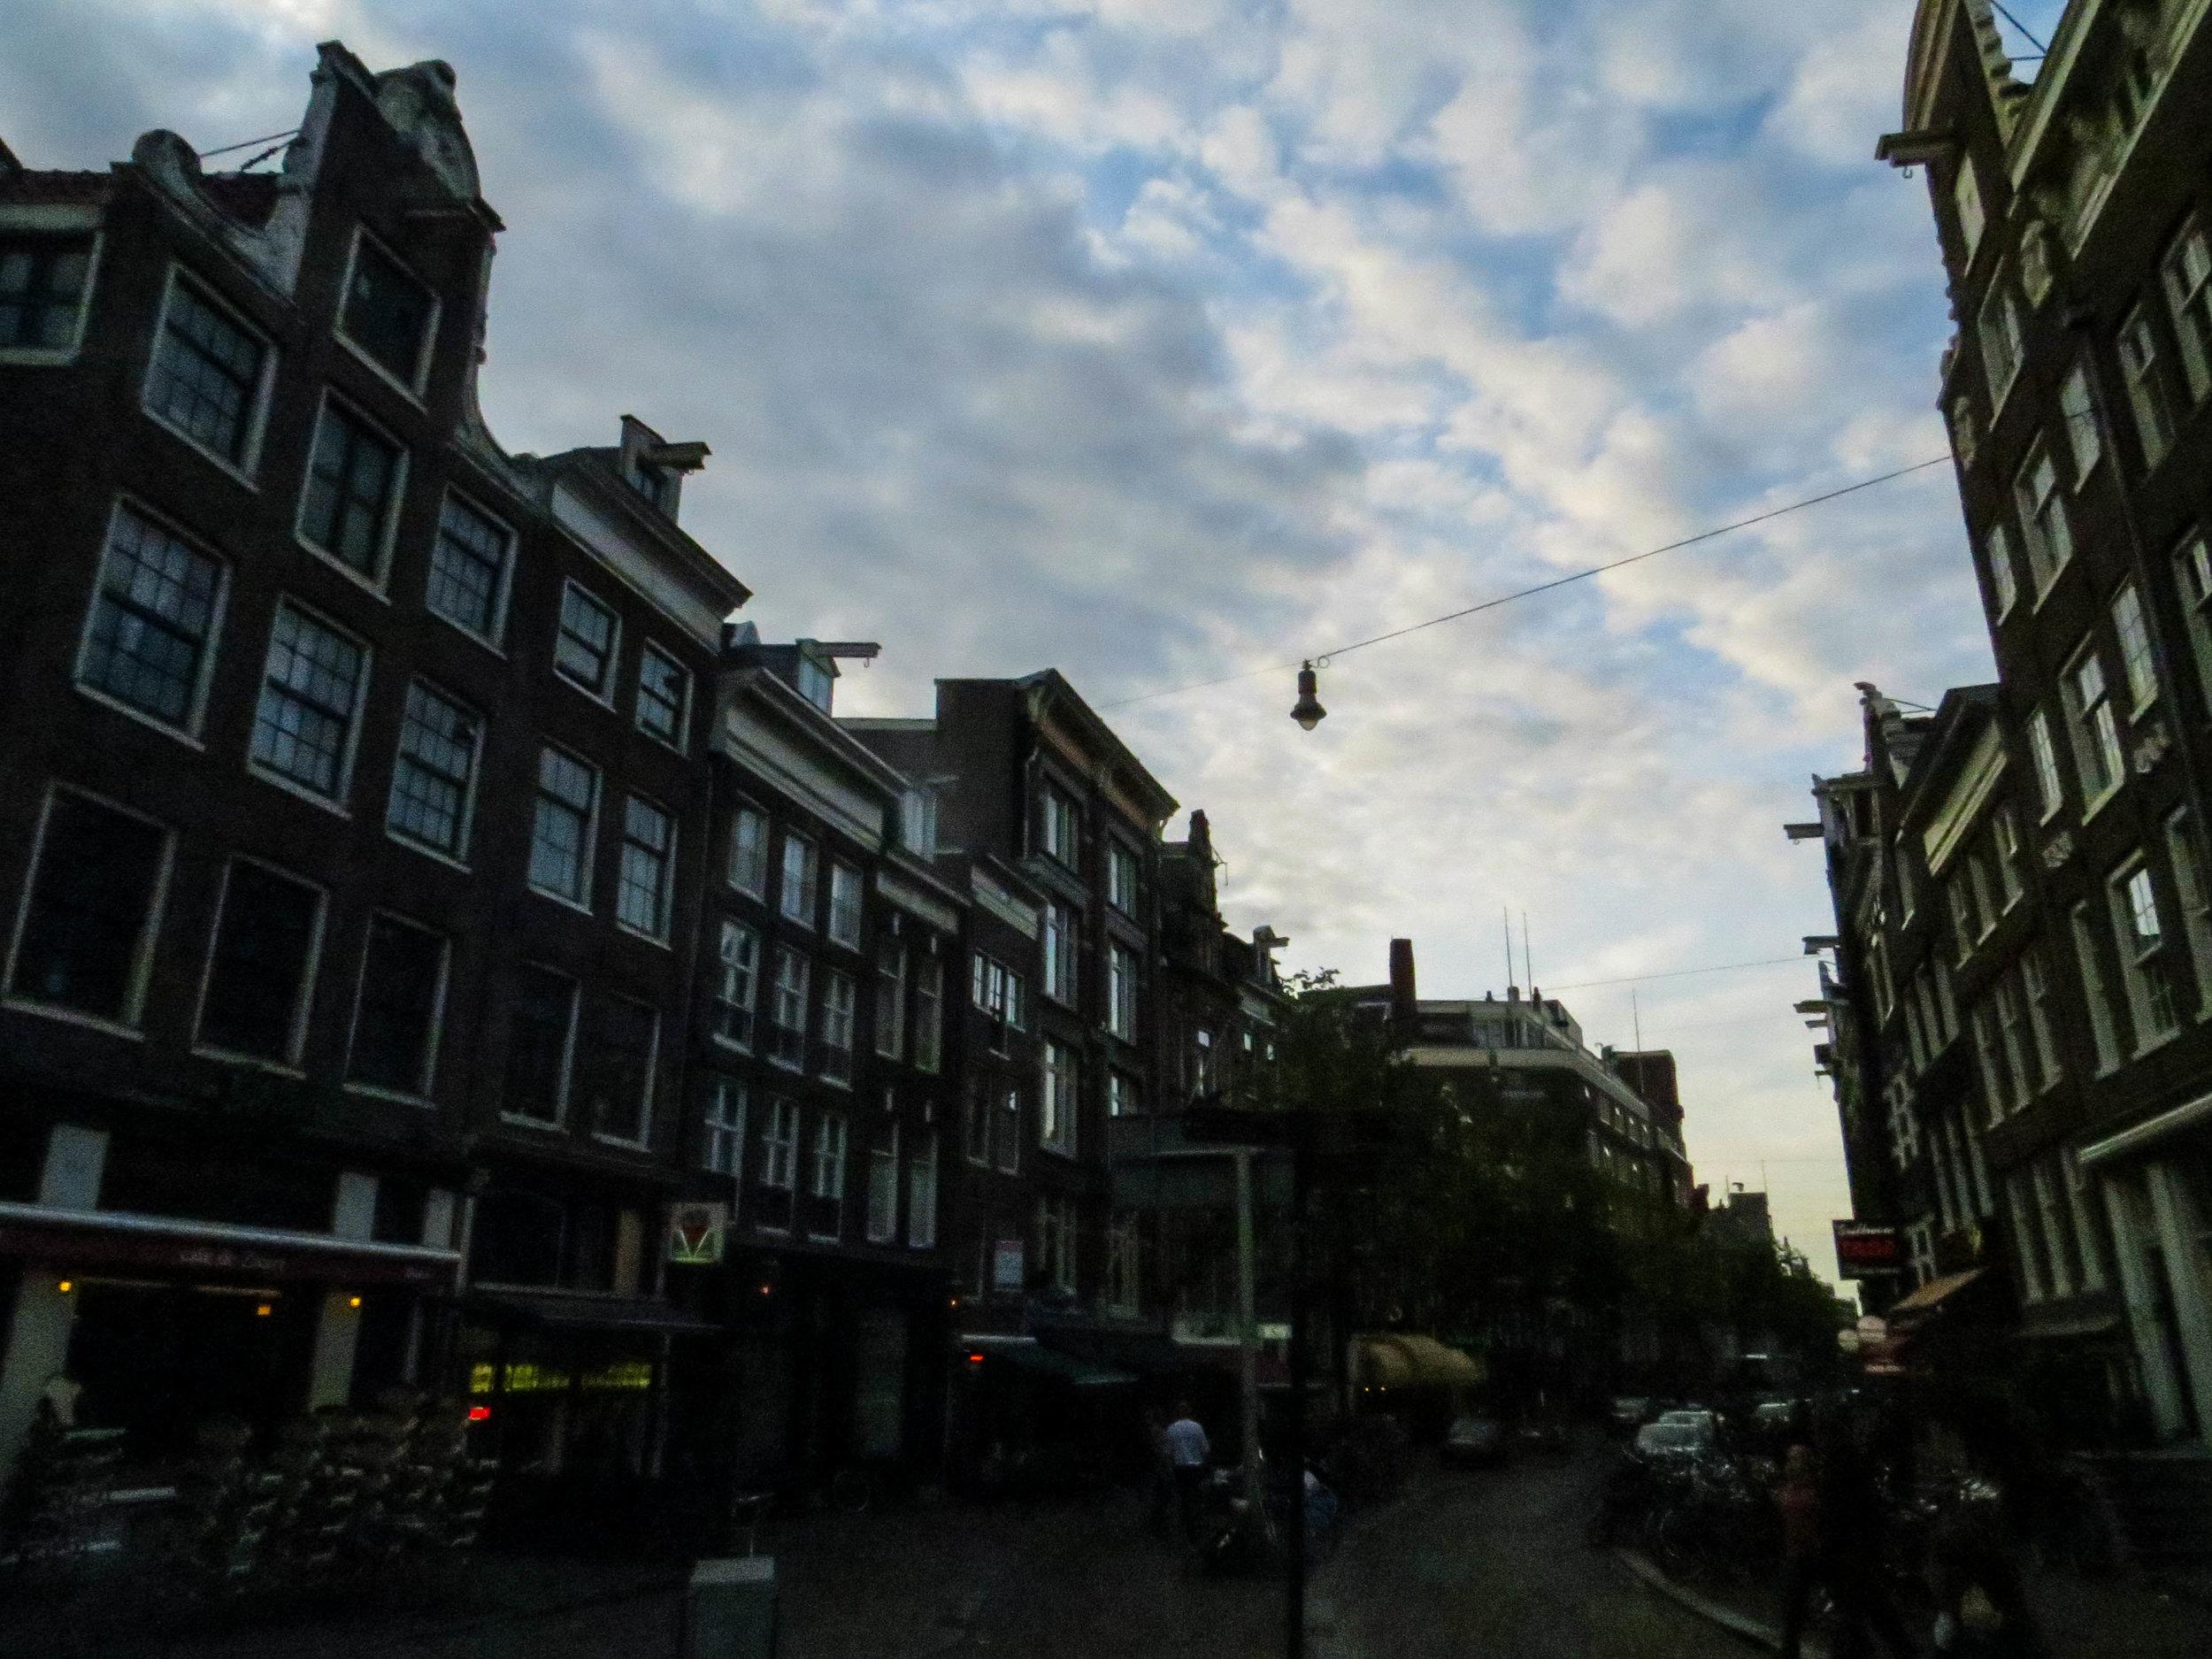 amsterdam-netherlands-street-photography-43.jpg